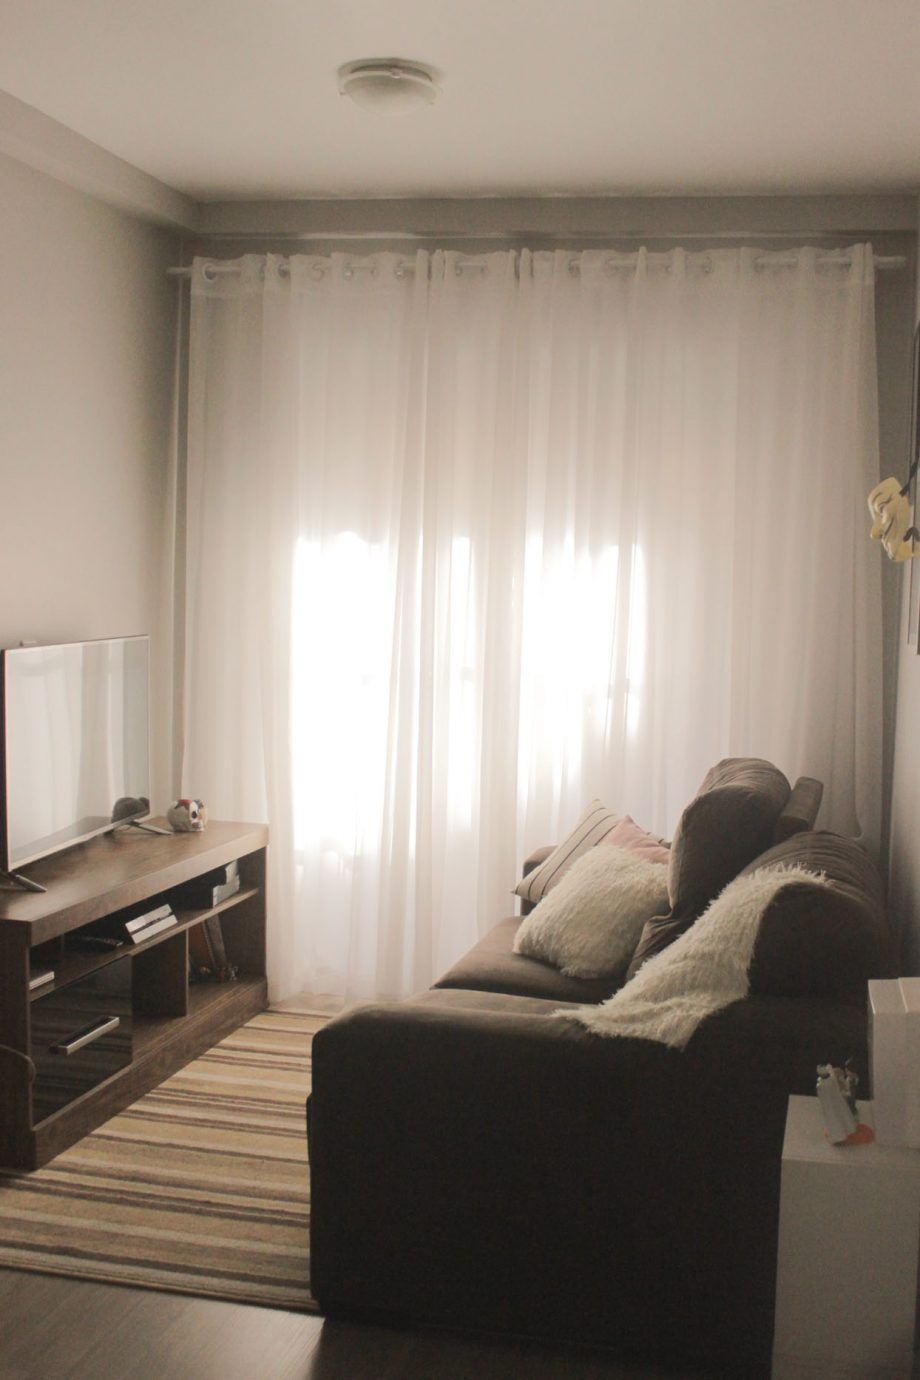 Cortina Eu Costurei Cortina Da Sala Branca Ate O Chao Cortina  ~ Cortinas De Luxo Para Quarto E Quarto Amarelo E Branco